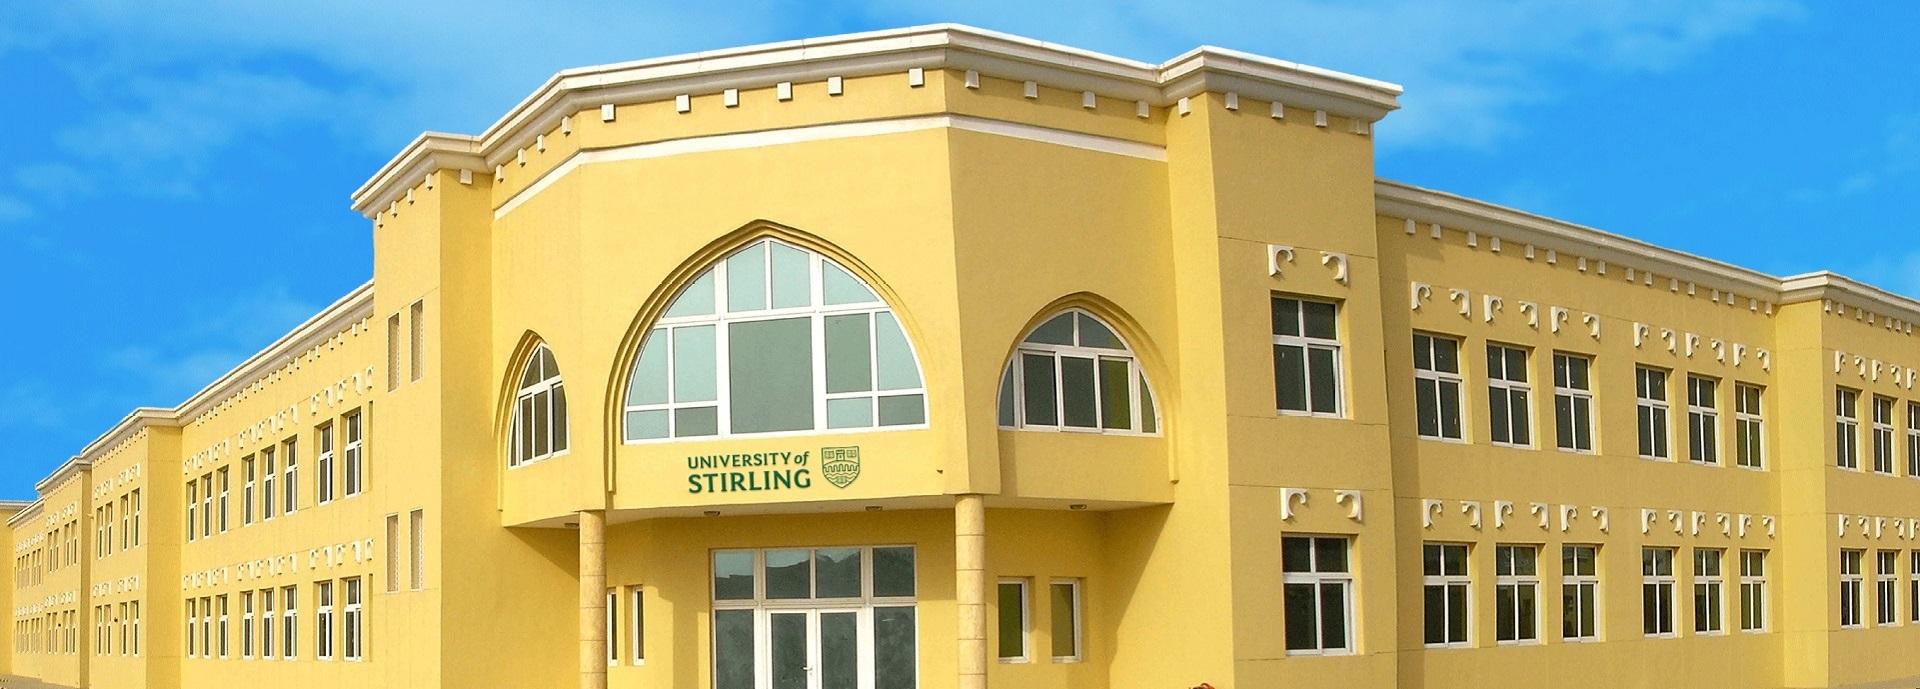 University launches partnership campus in United Arab Emirates